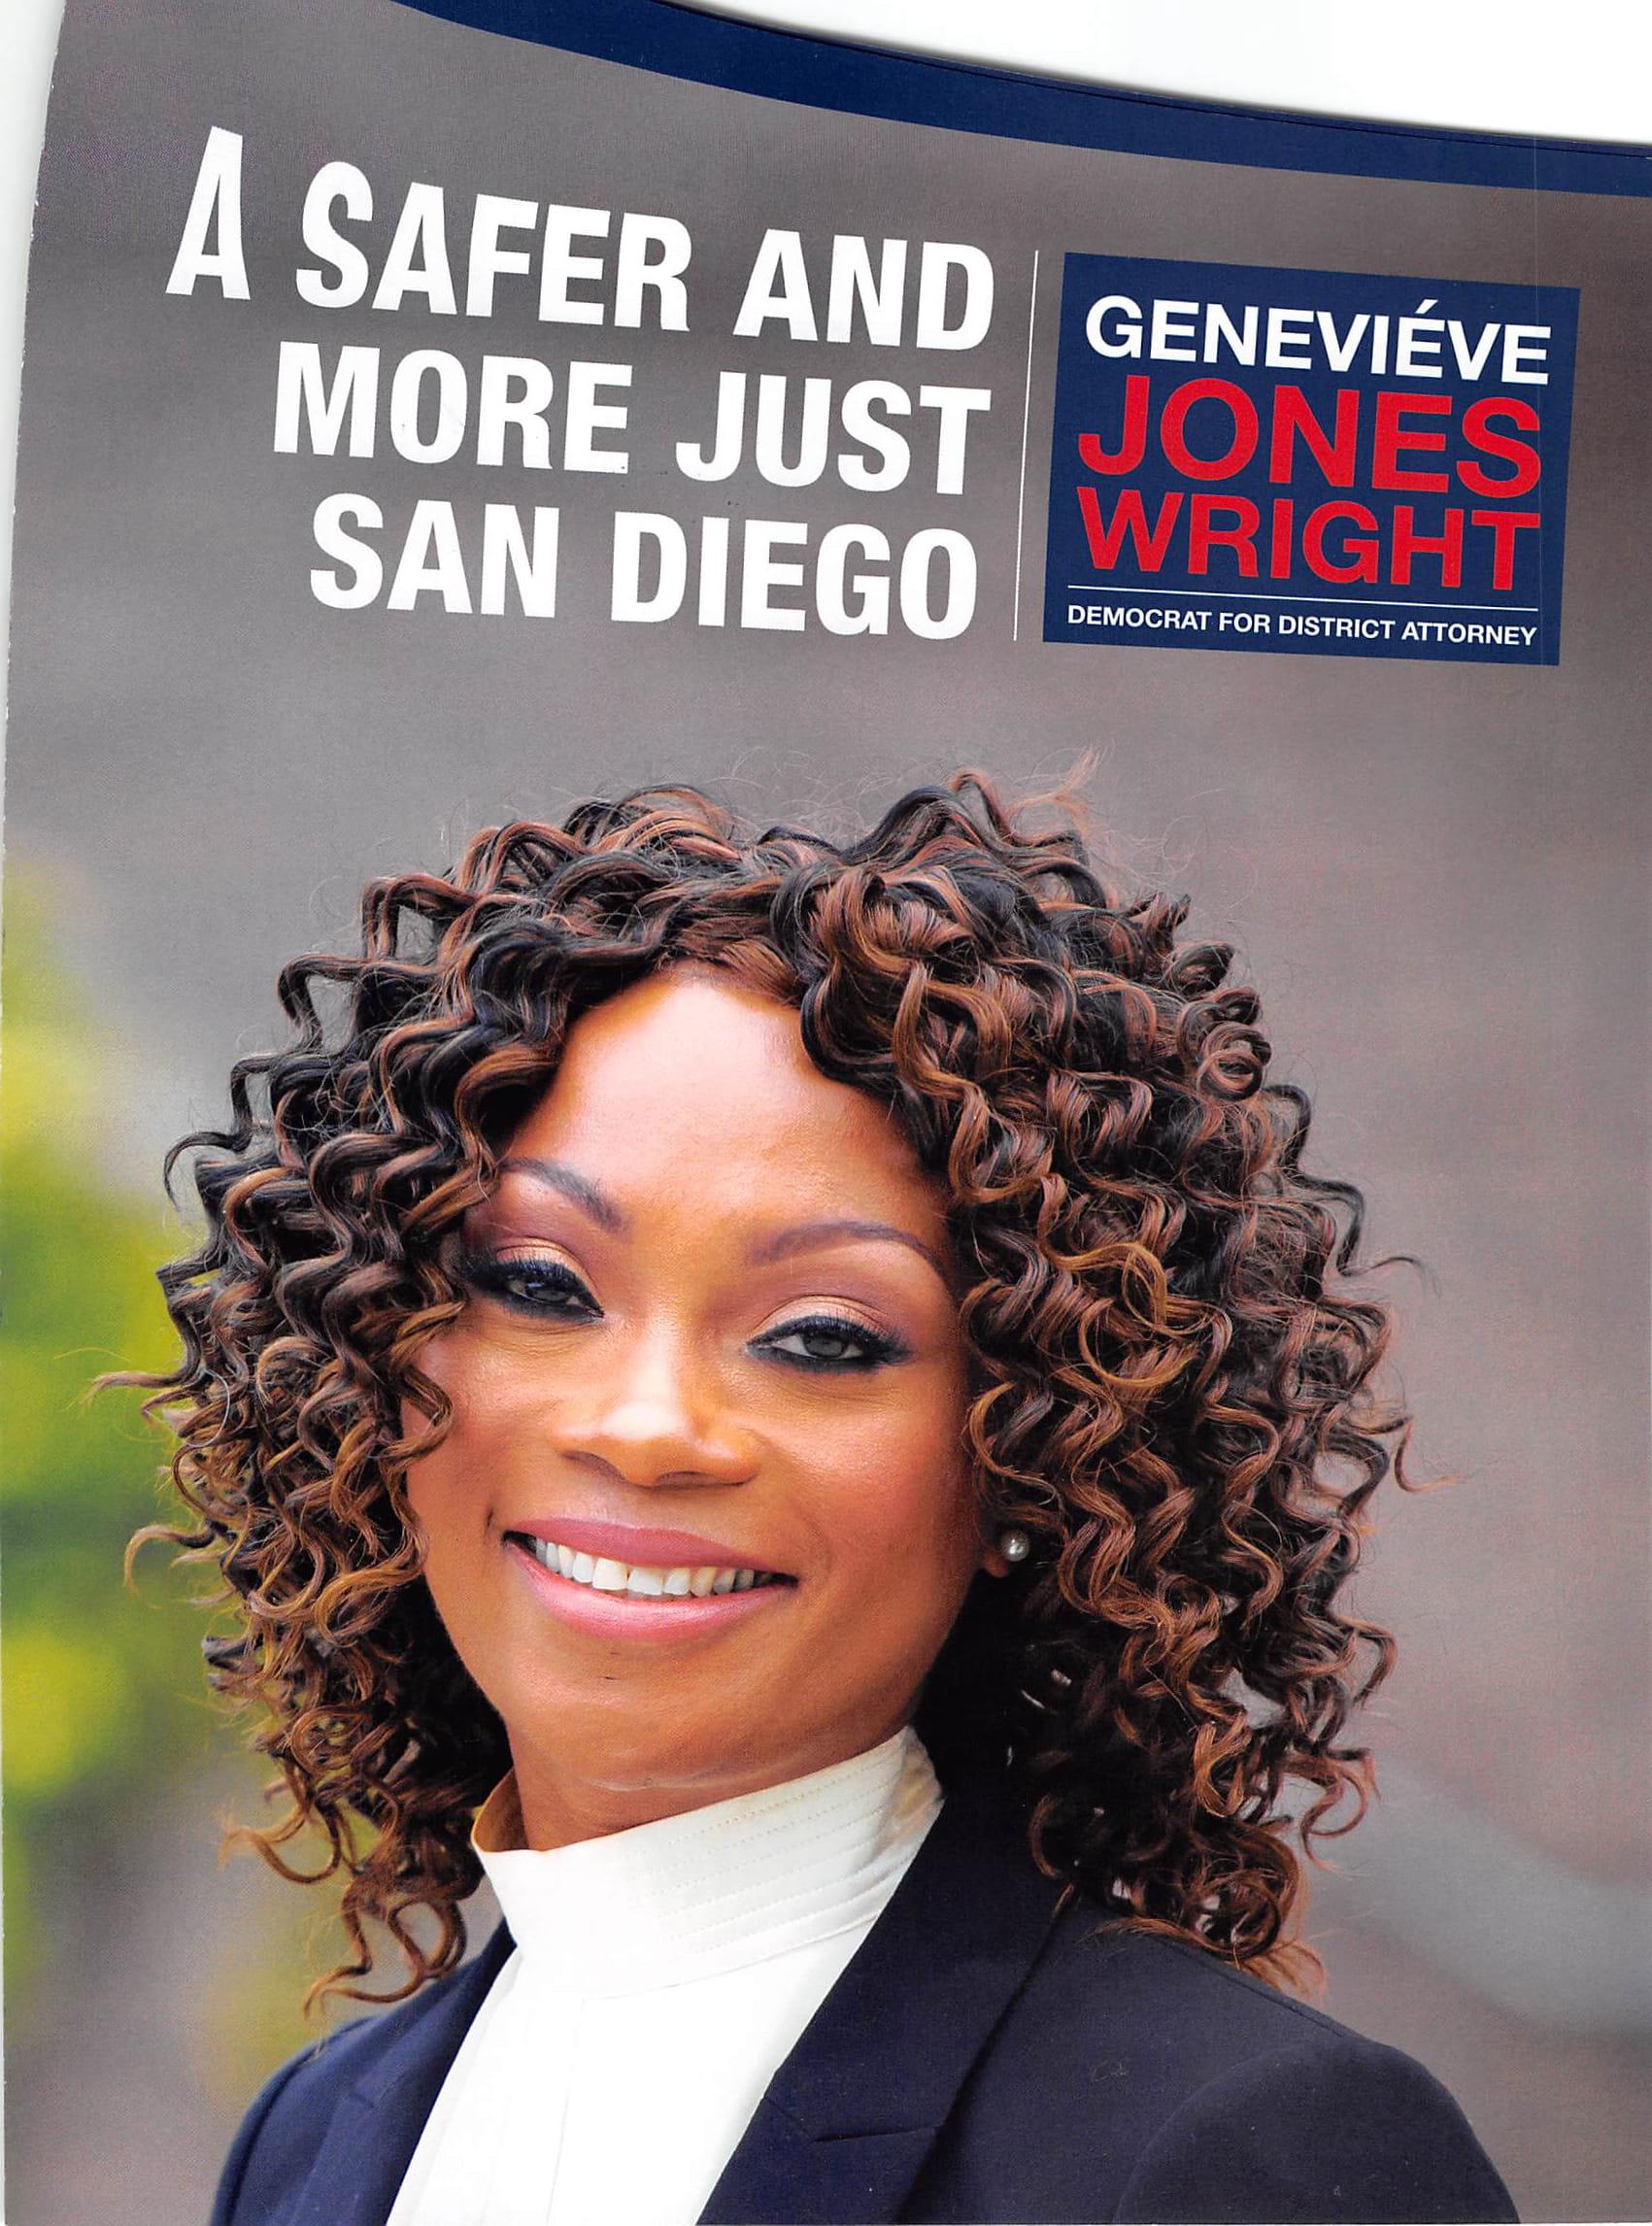 Genevieve Jones Wright for District Attorney